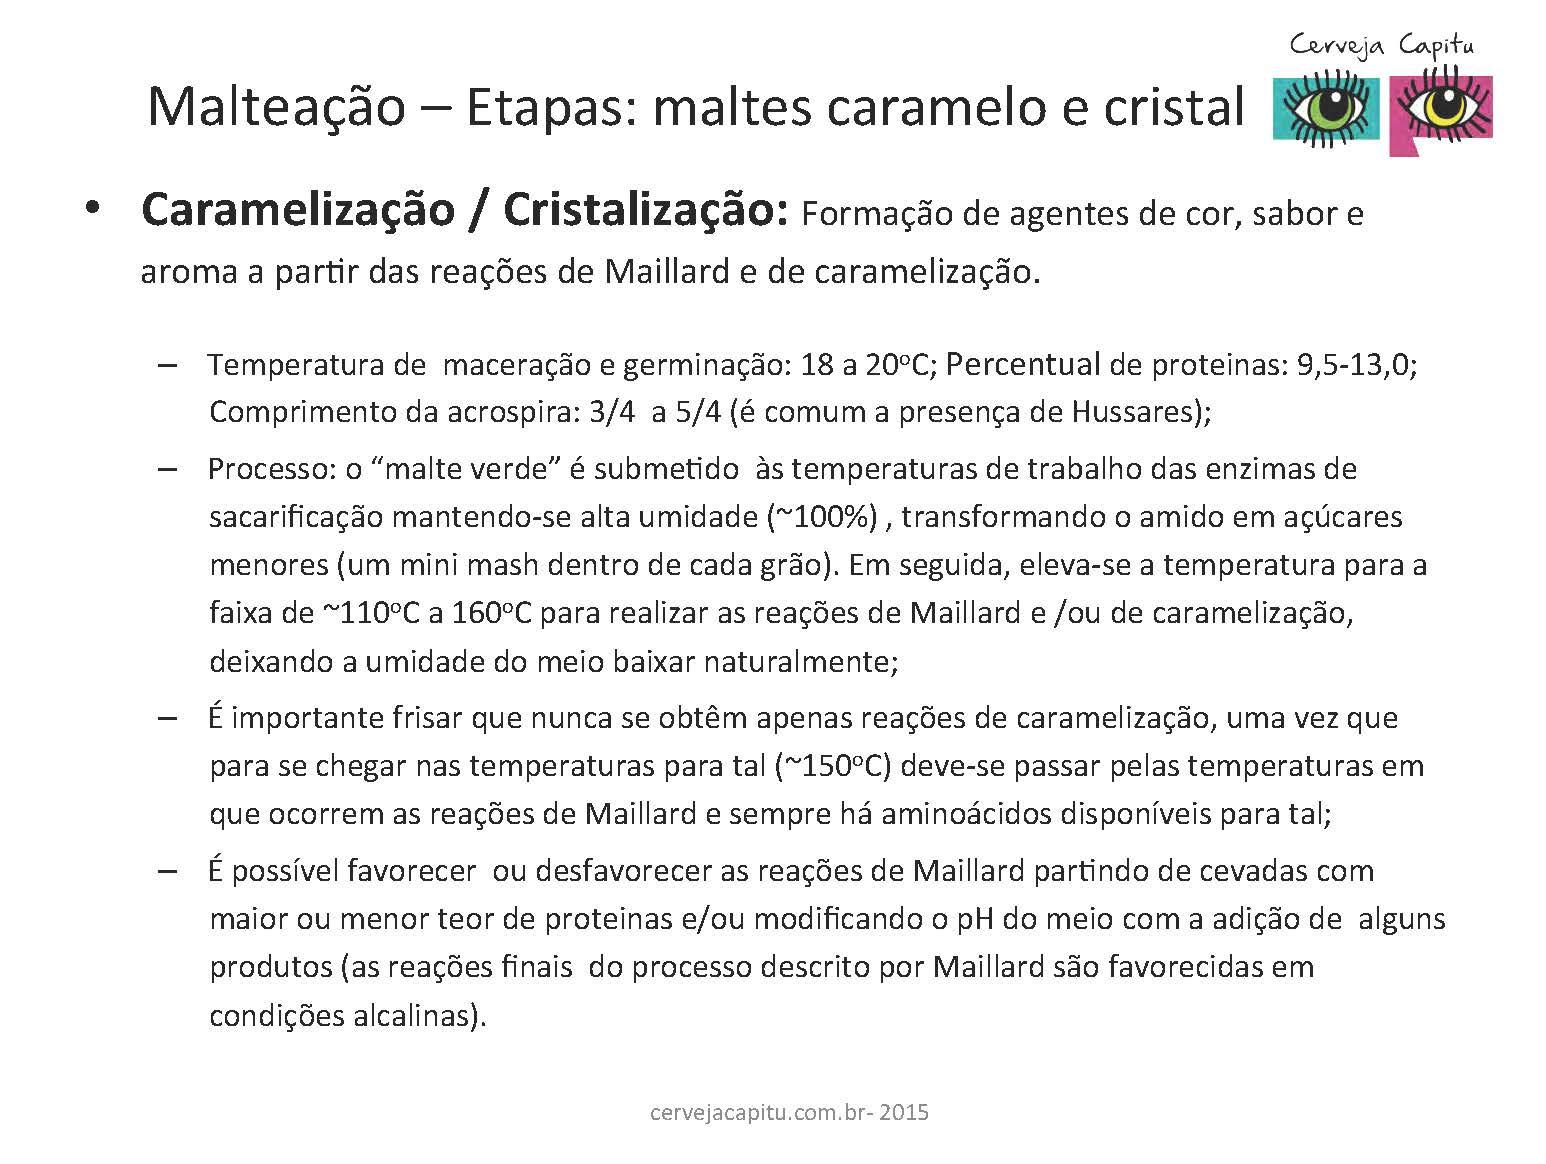 Princípios da Malteação_Capitu_SM_Page_12.jpg